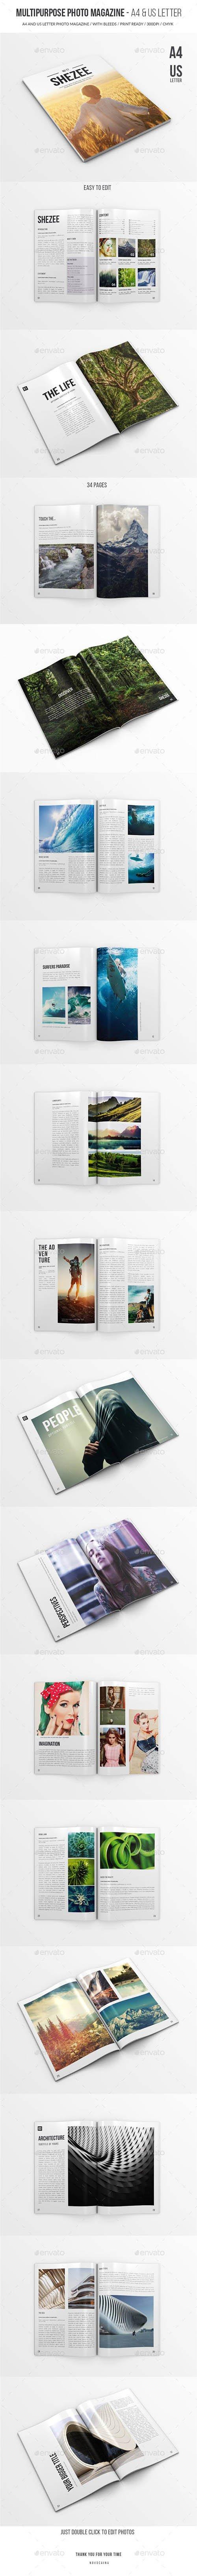 Multipurpose Photo Magazine - A4 & US Letter 19587429